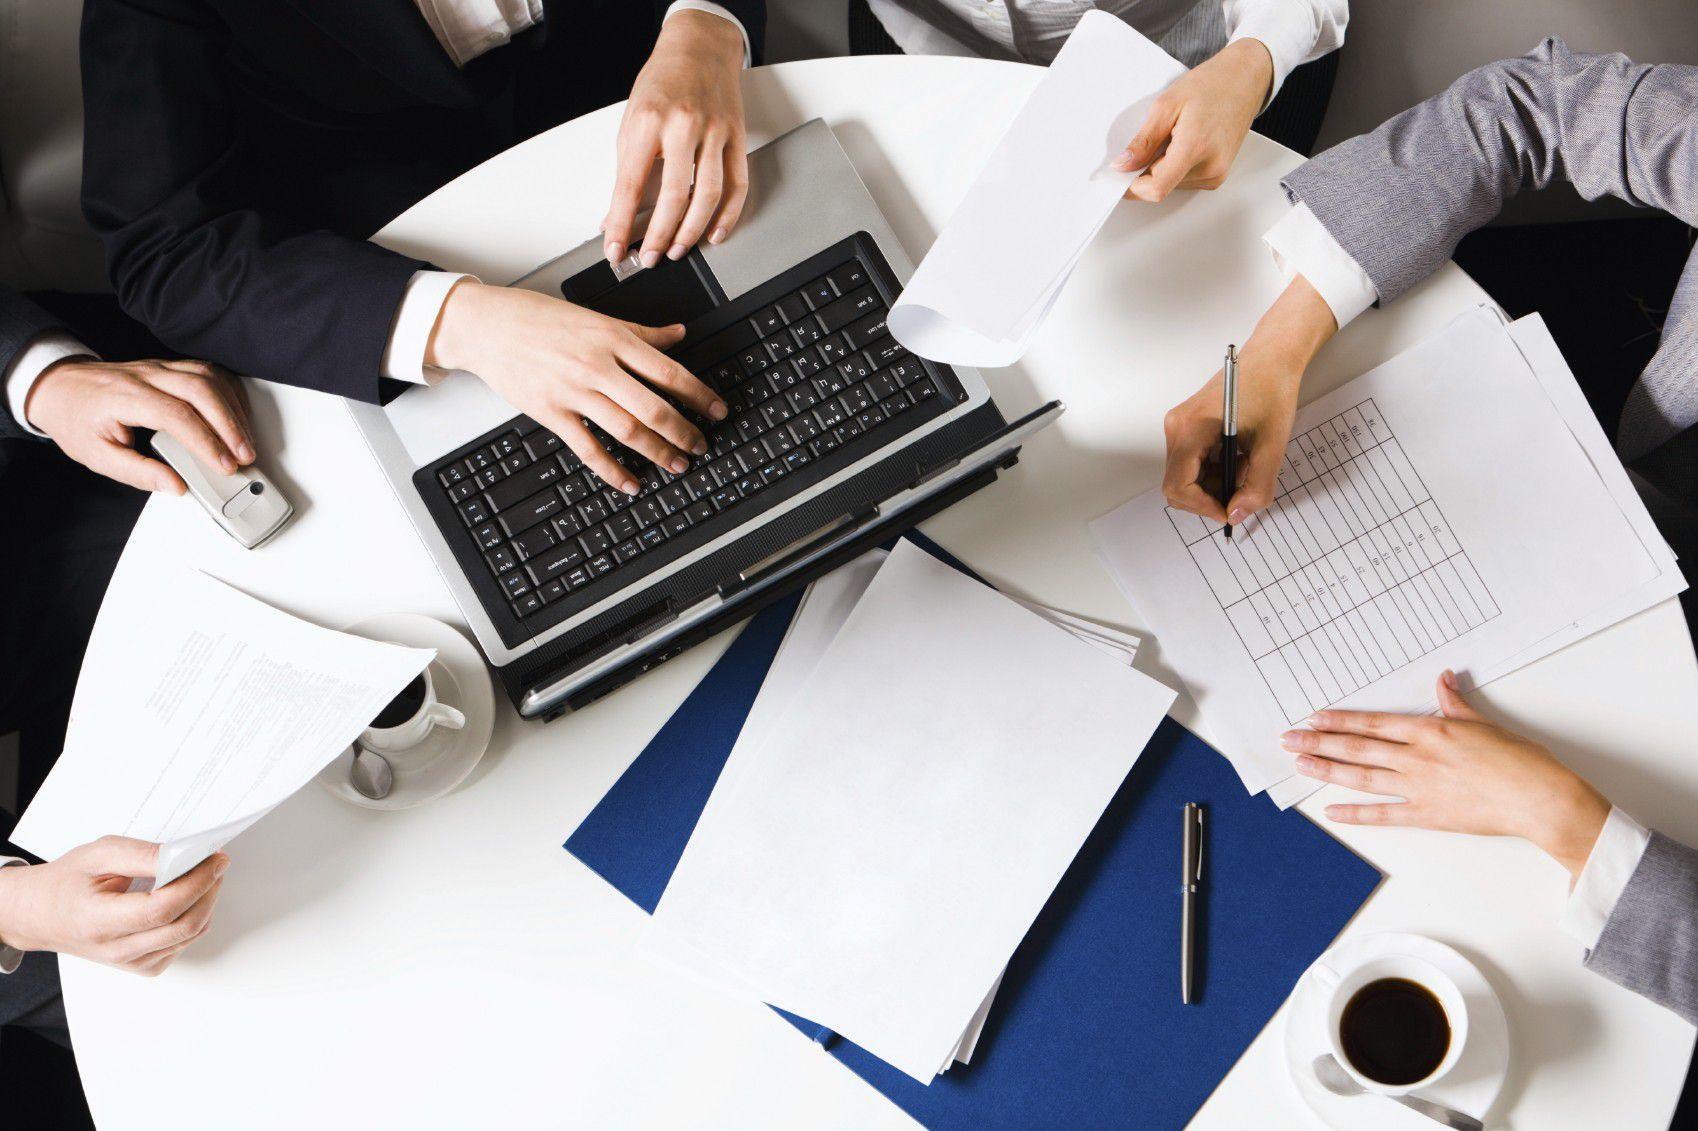 Подготовка и анализ документов